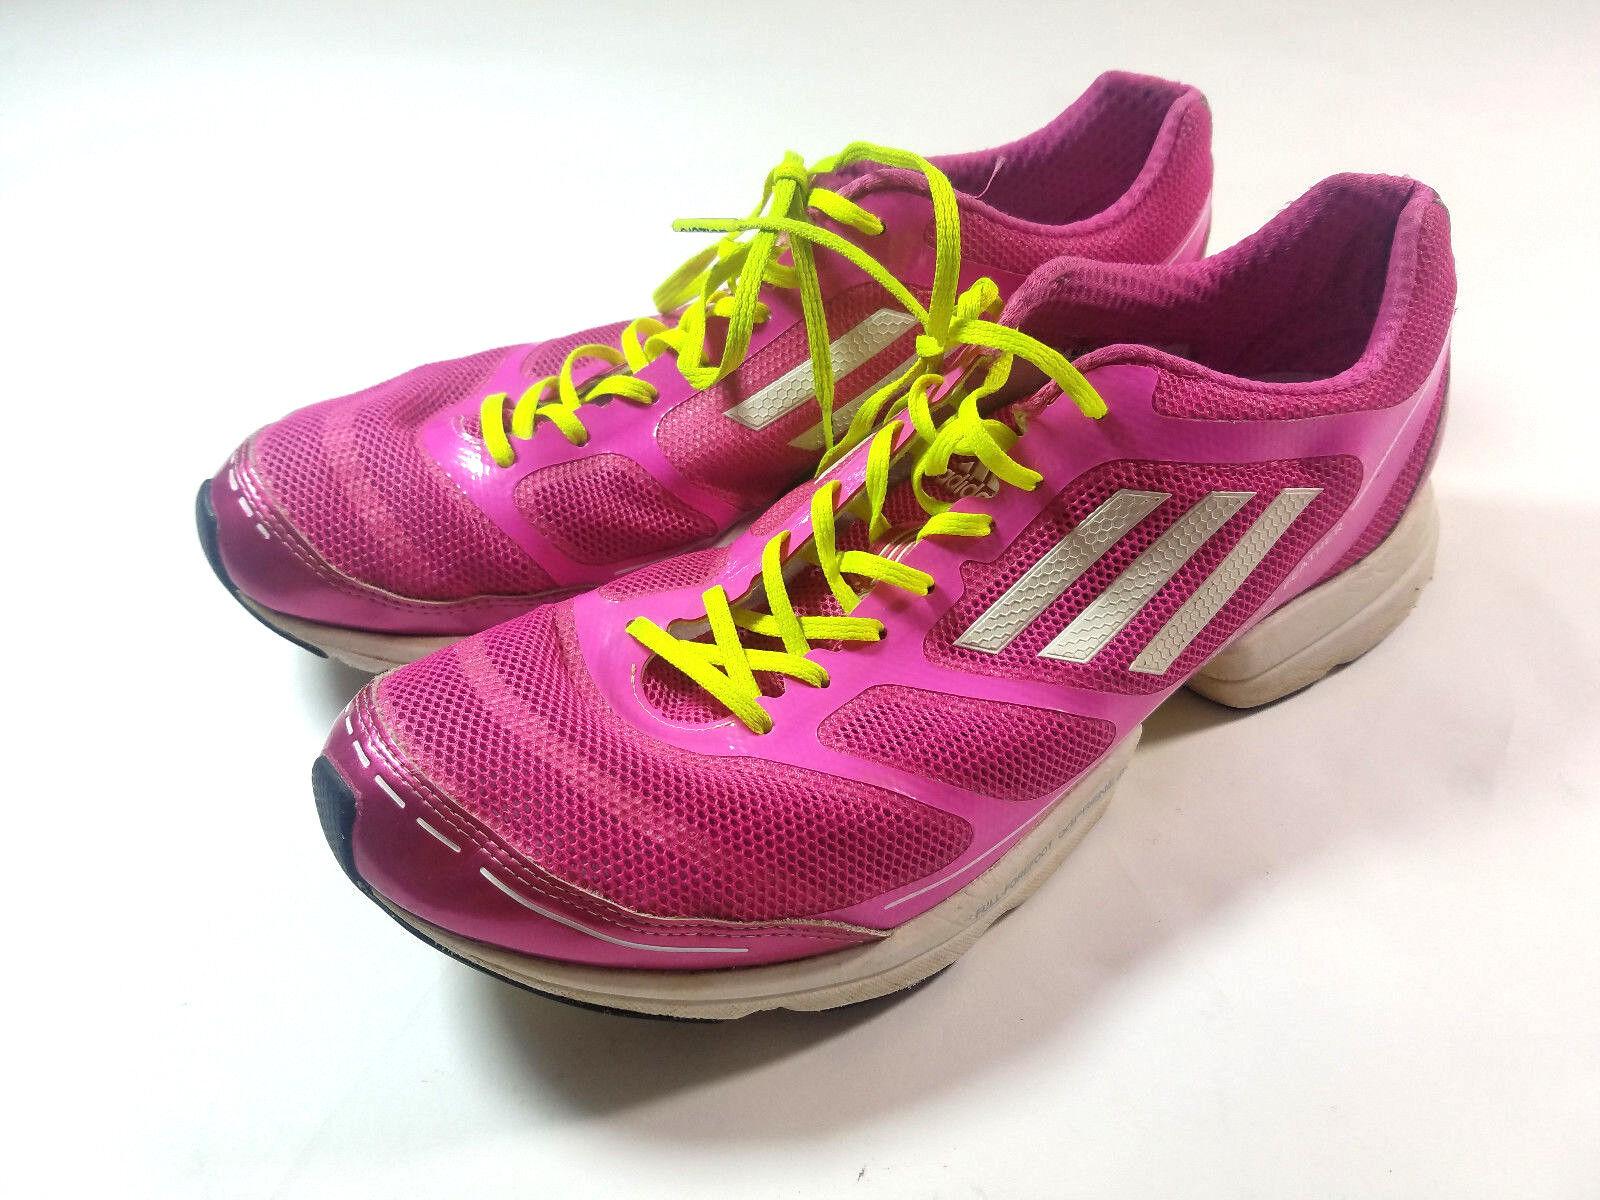 "Adidas Adizero Feather Ξ""Ο…Ξ½Ξ±ΞΉΞΊΟŽΞ½ Sz 10 Αο Running Shoes ΕκπαίδΡυση Sprint Adiprene"